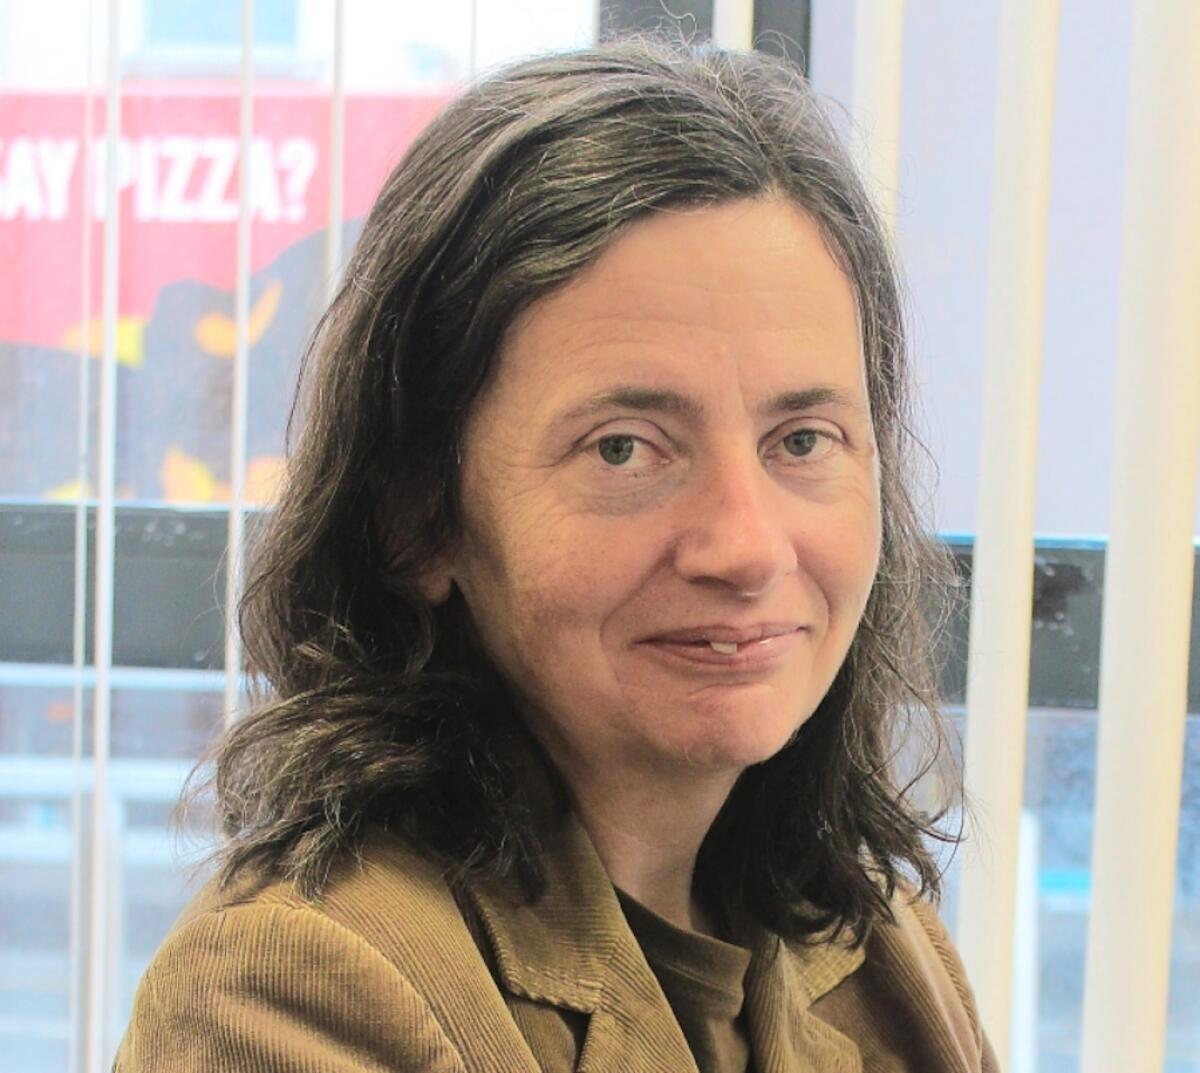 Author / Historian Ruth Illingford